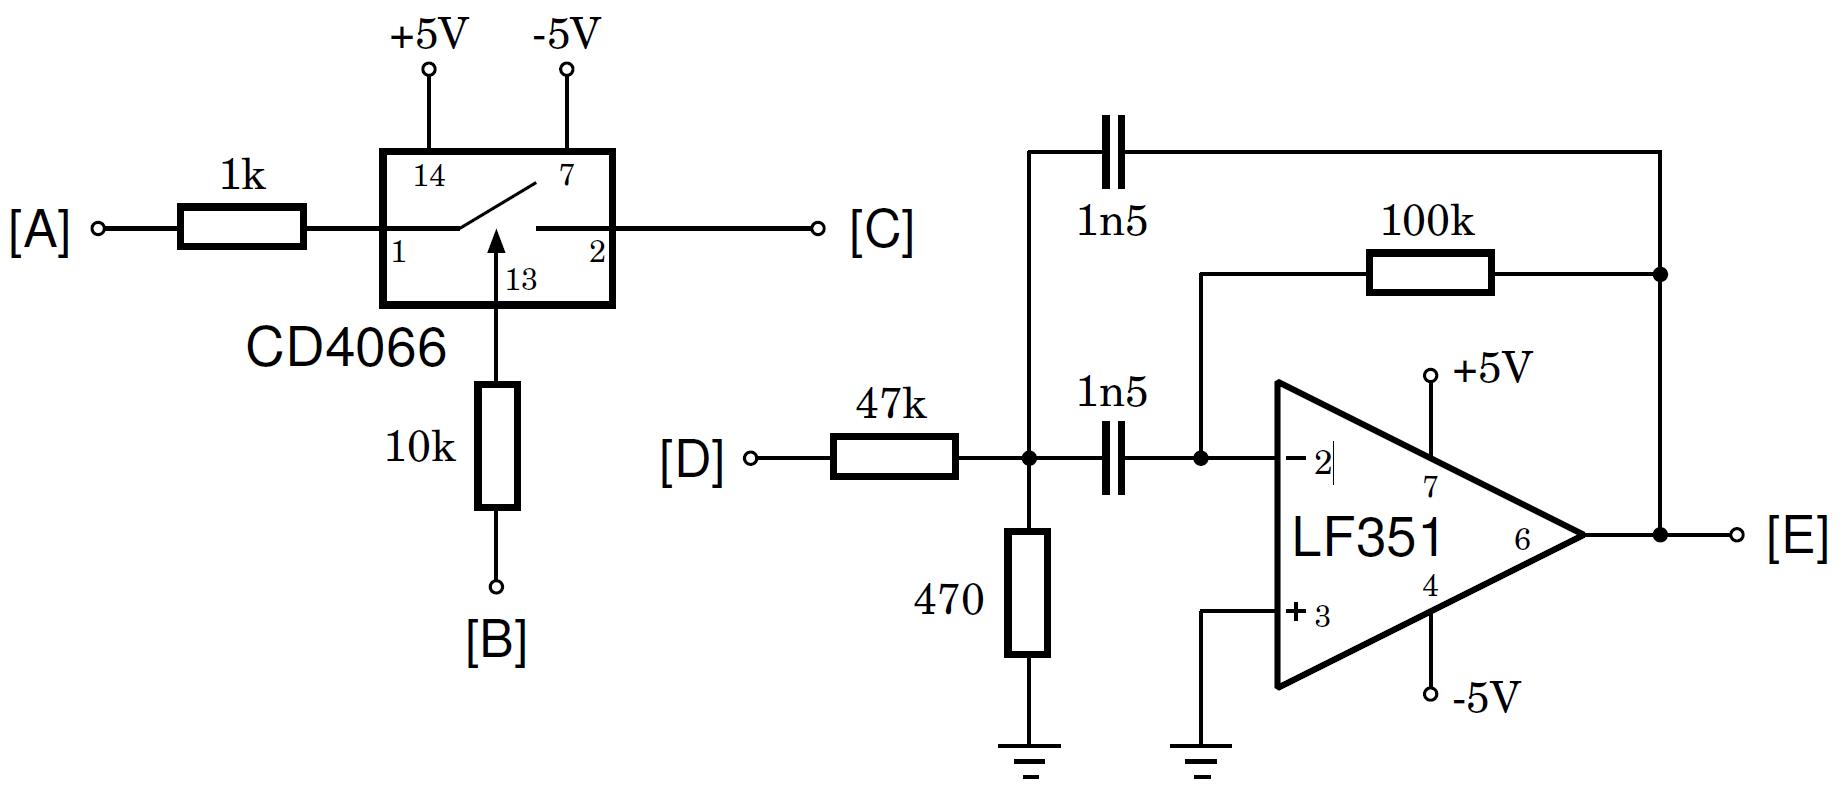 fm modulator circuit schematic